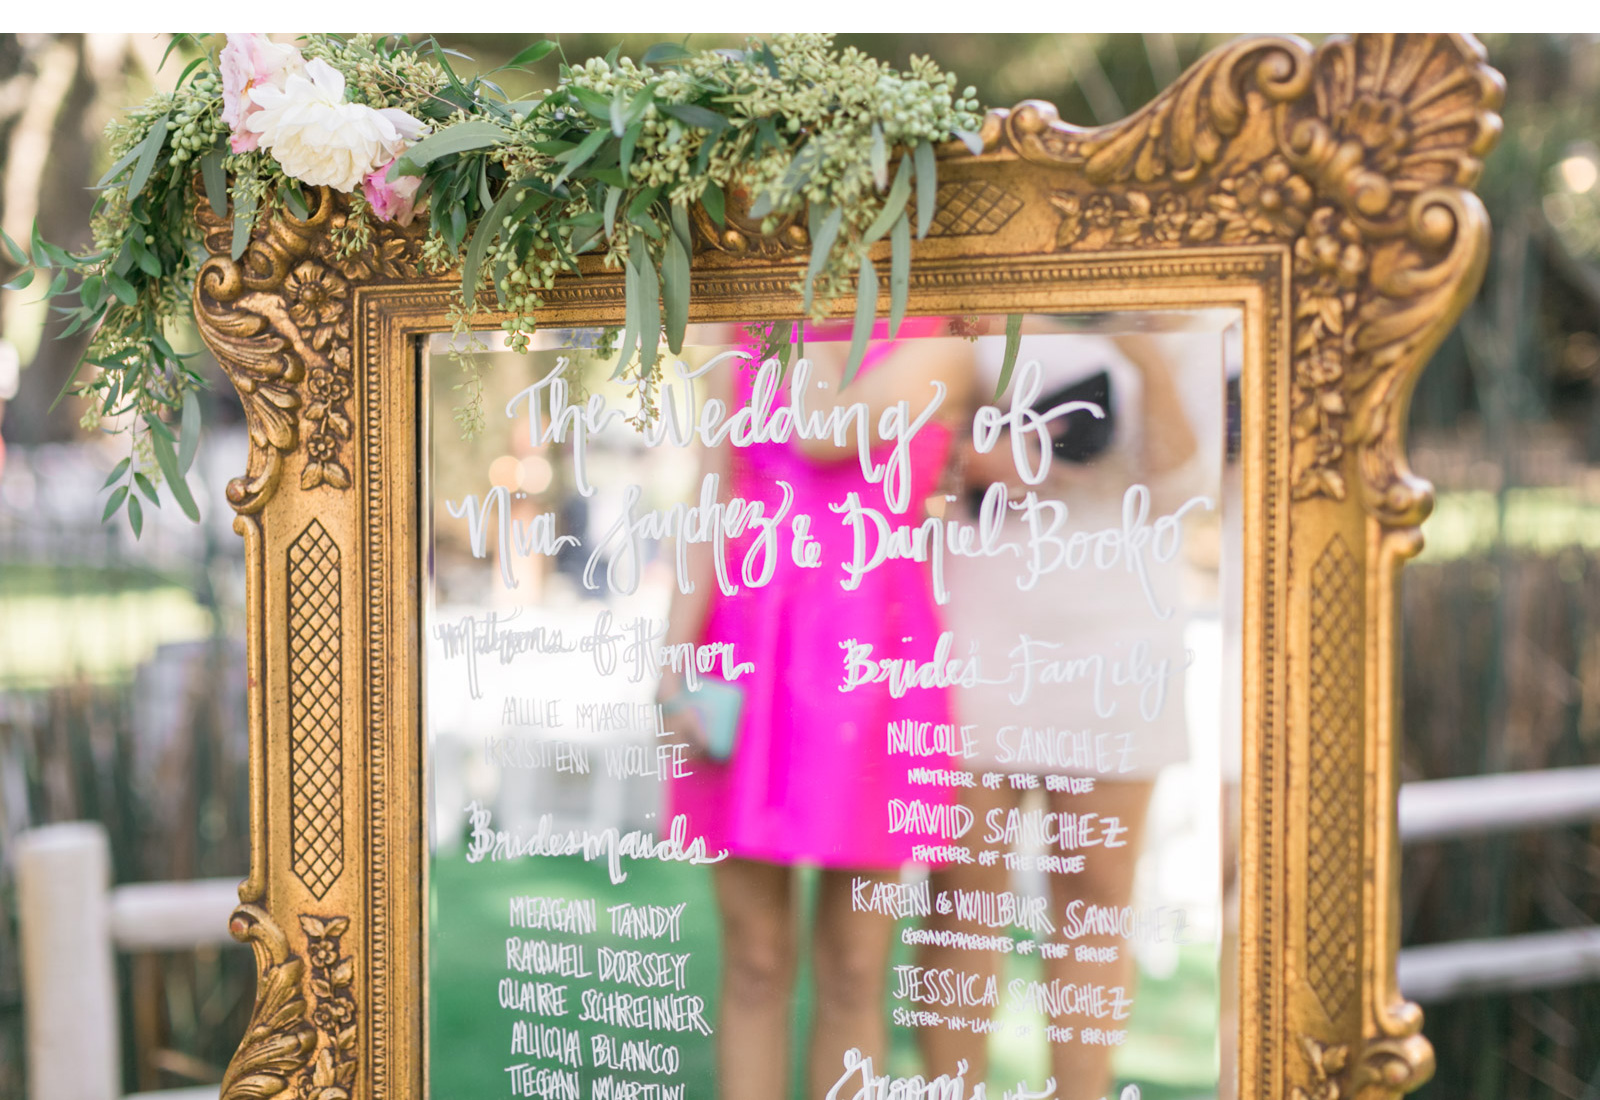 Nia-Sanchez-Wedding-Natalie-Schutt-Photography_01.jpg